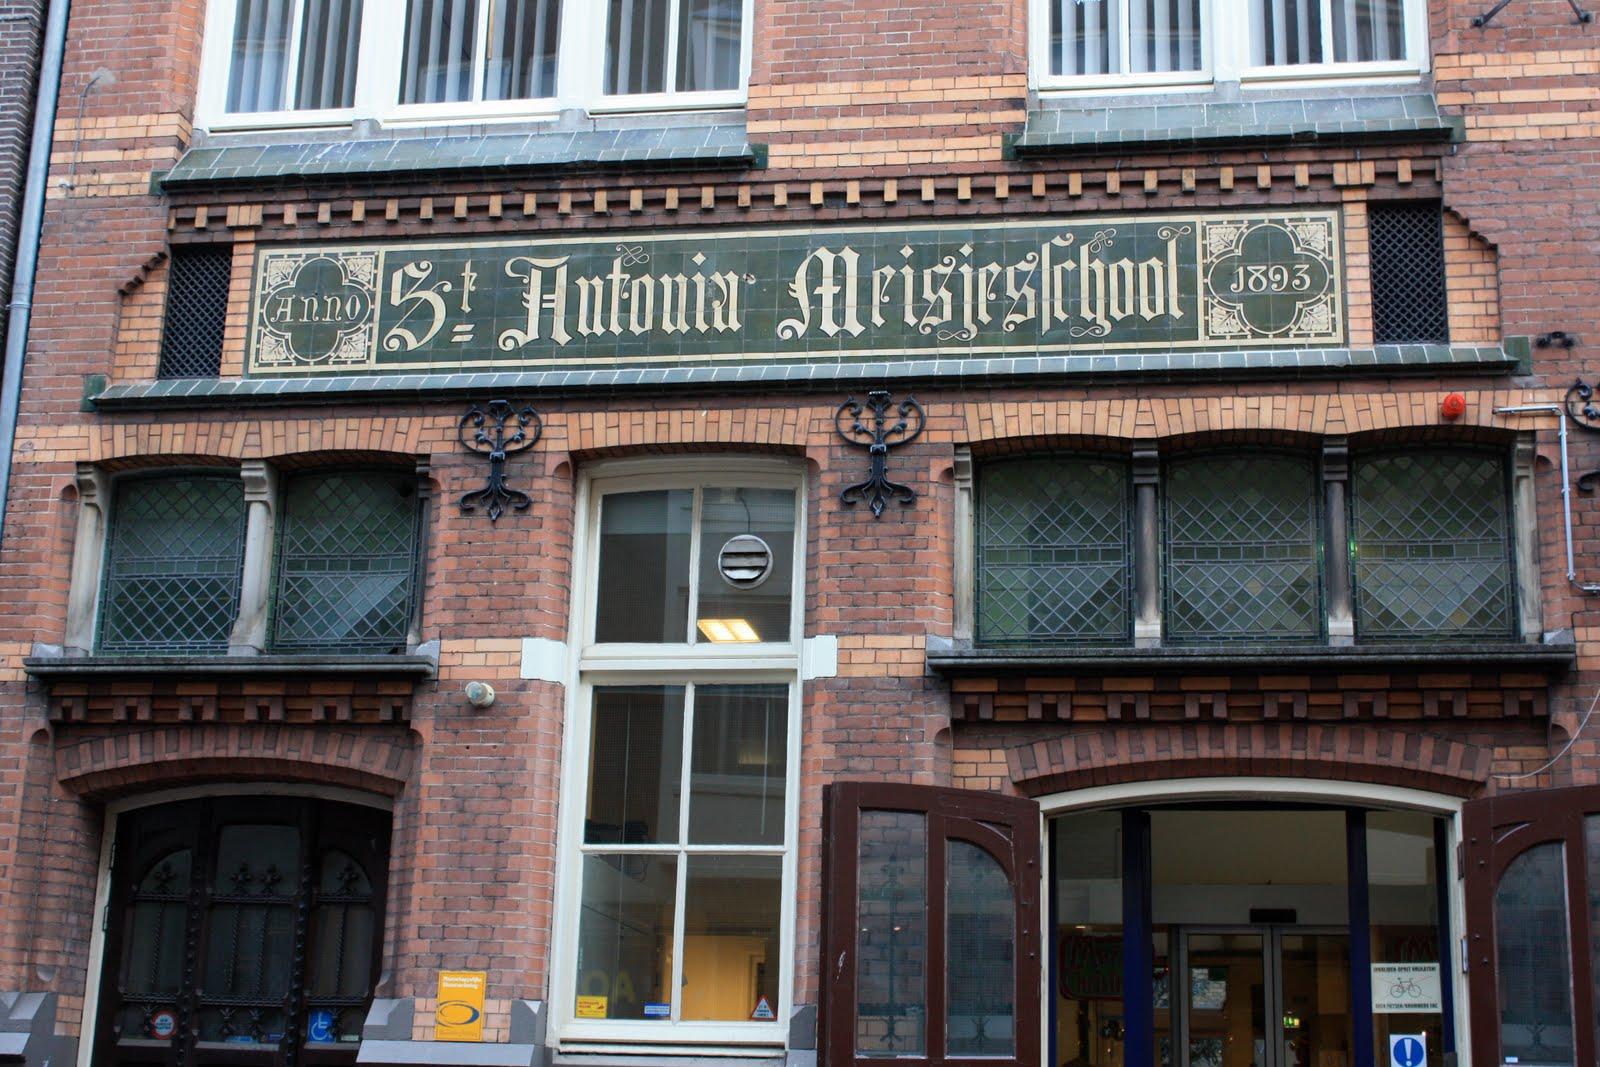 st antonia meisjes school - St. Antonia's girl's school on Haarlemmerstraat